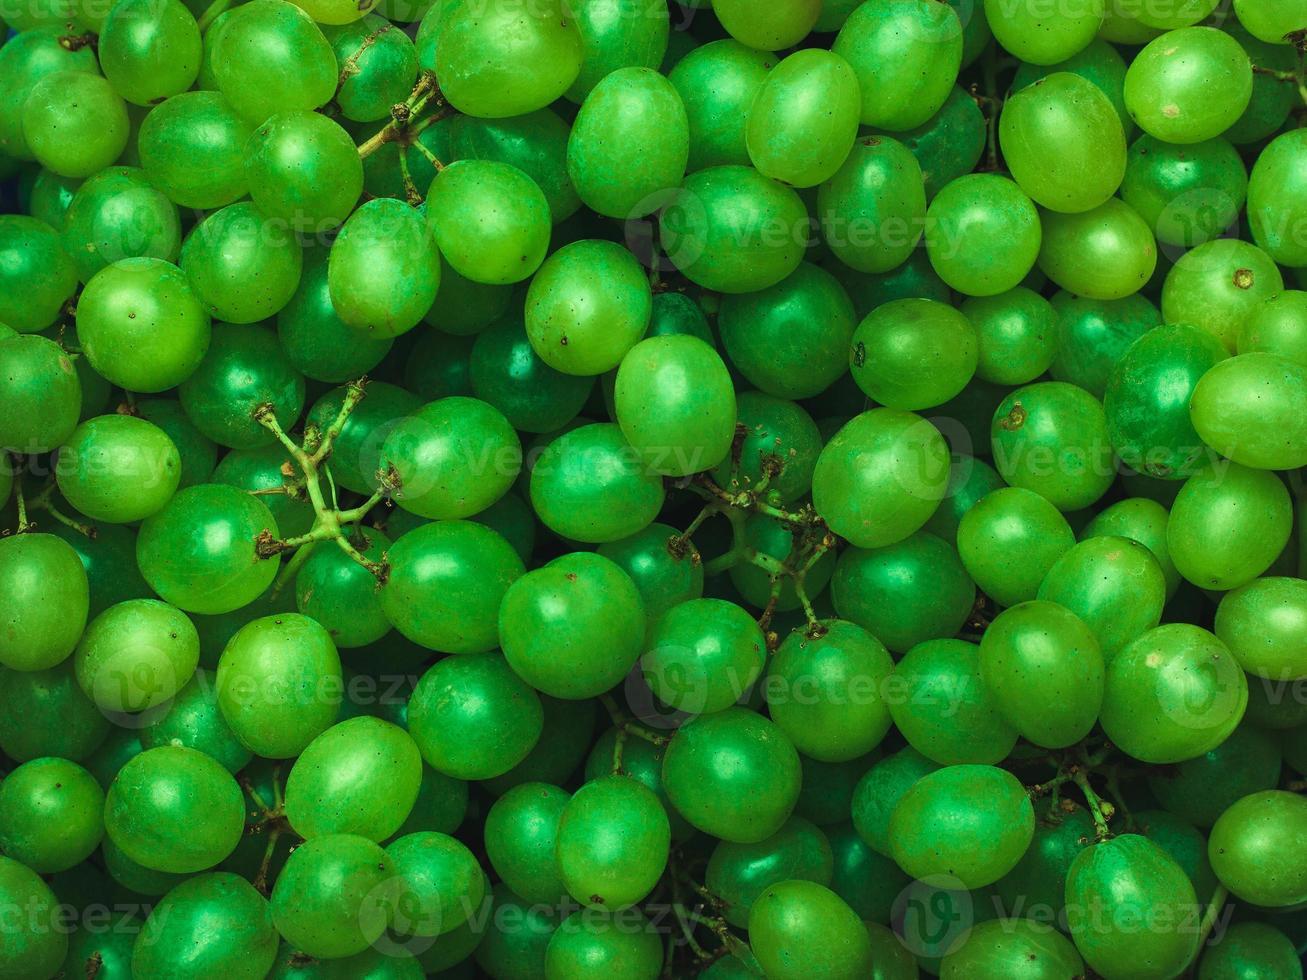 grandi uve verdi. foto